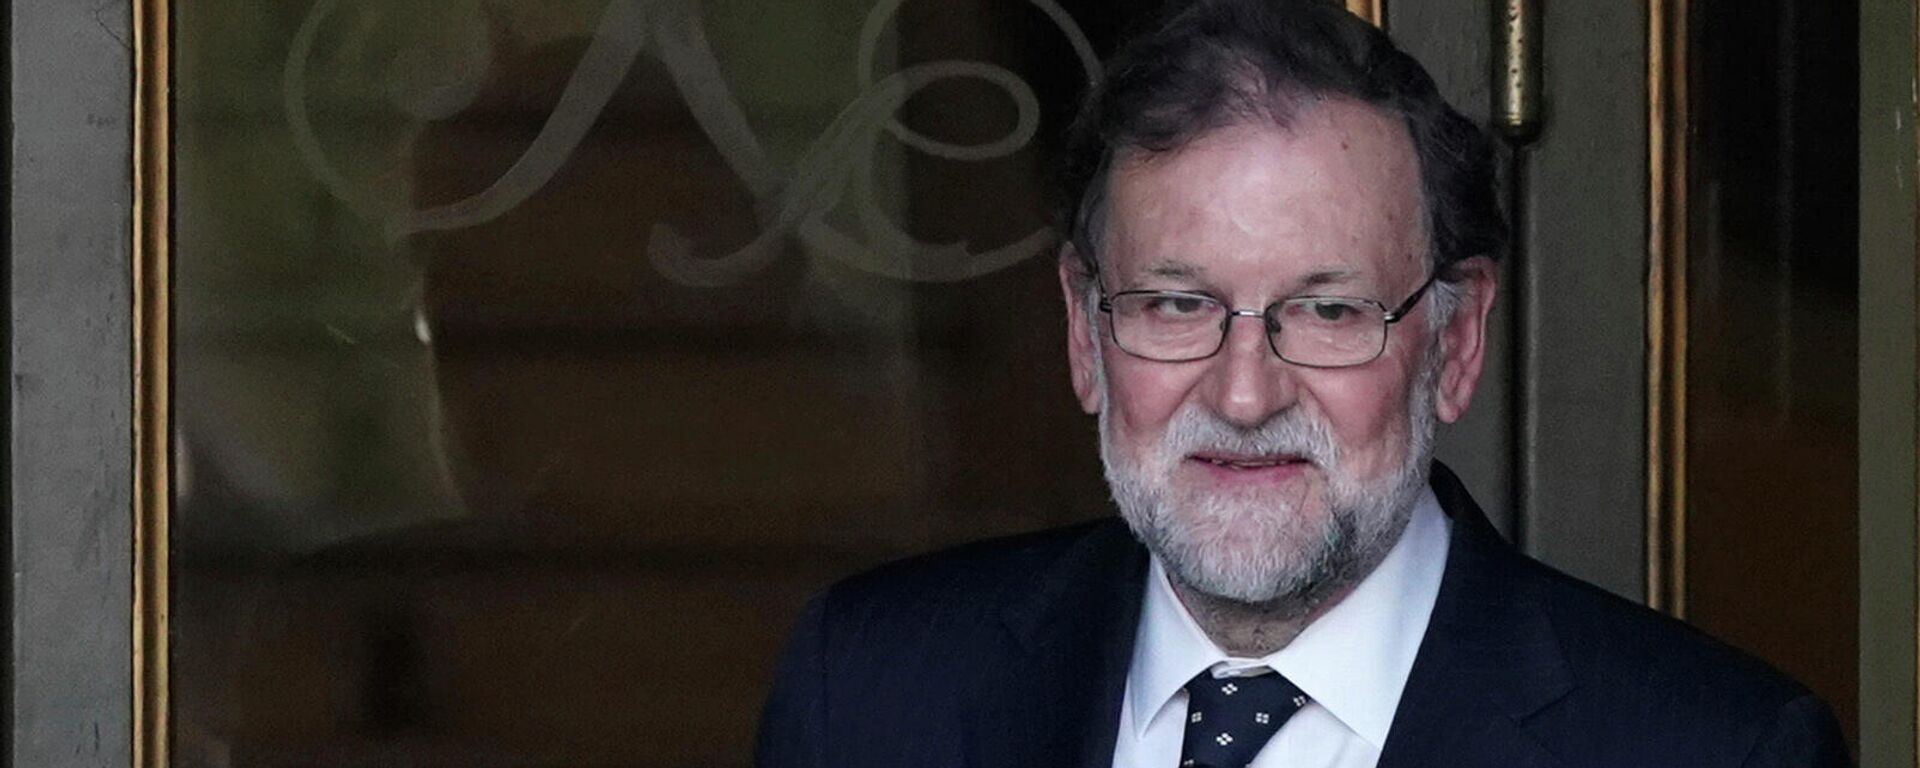 Mariano Rajoy, expresidente del Gobierno español - Sputnik Mundo, 1920, 09.03.2021